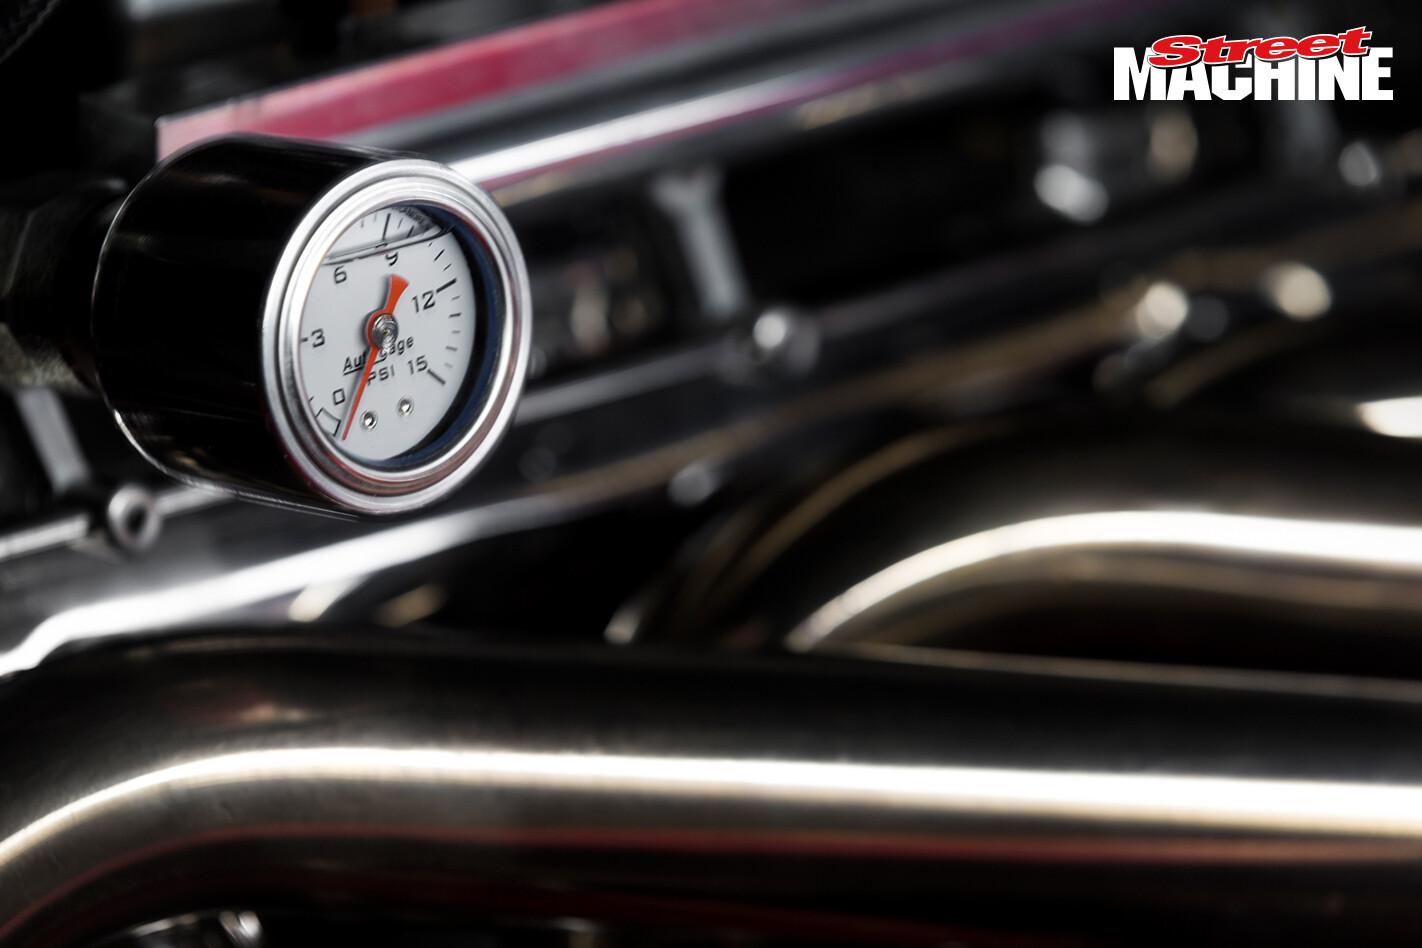 Firechief Fiat Hot Rod 15 Nw Jpg